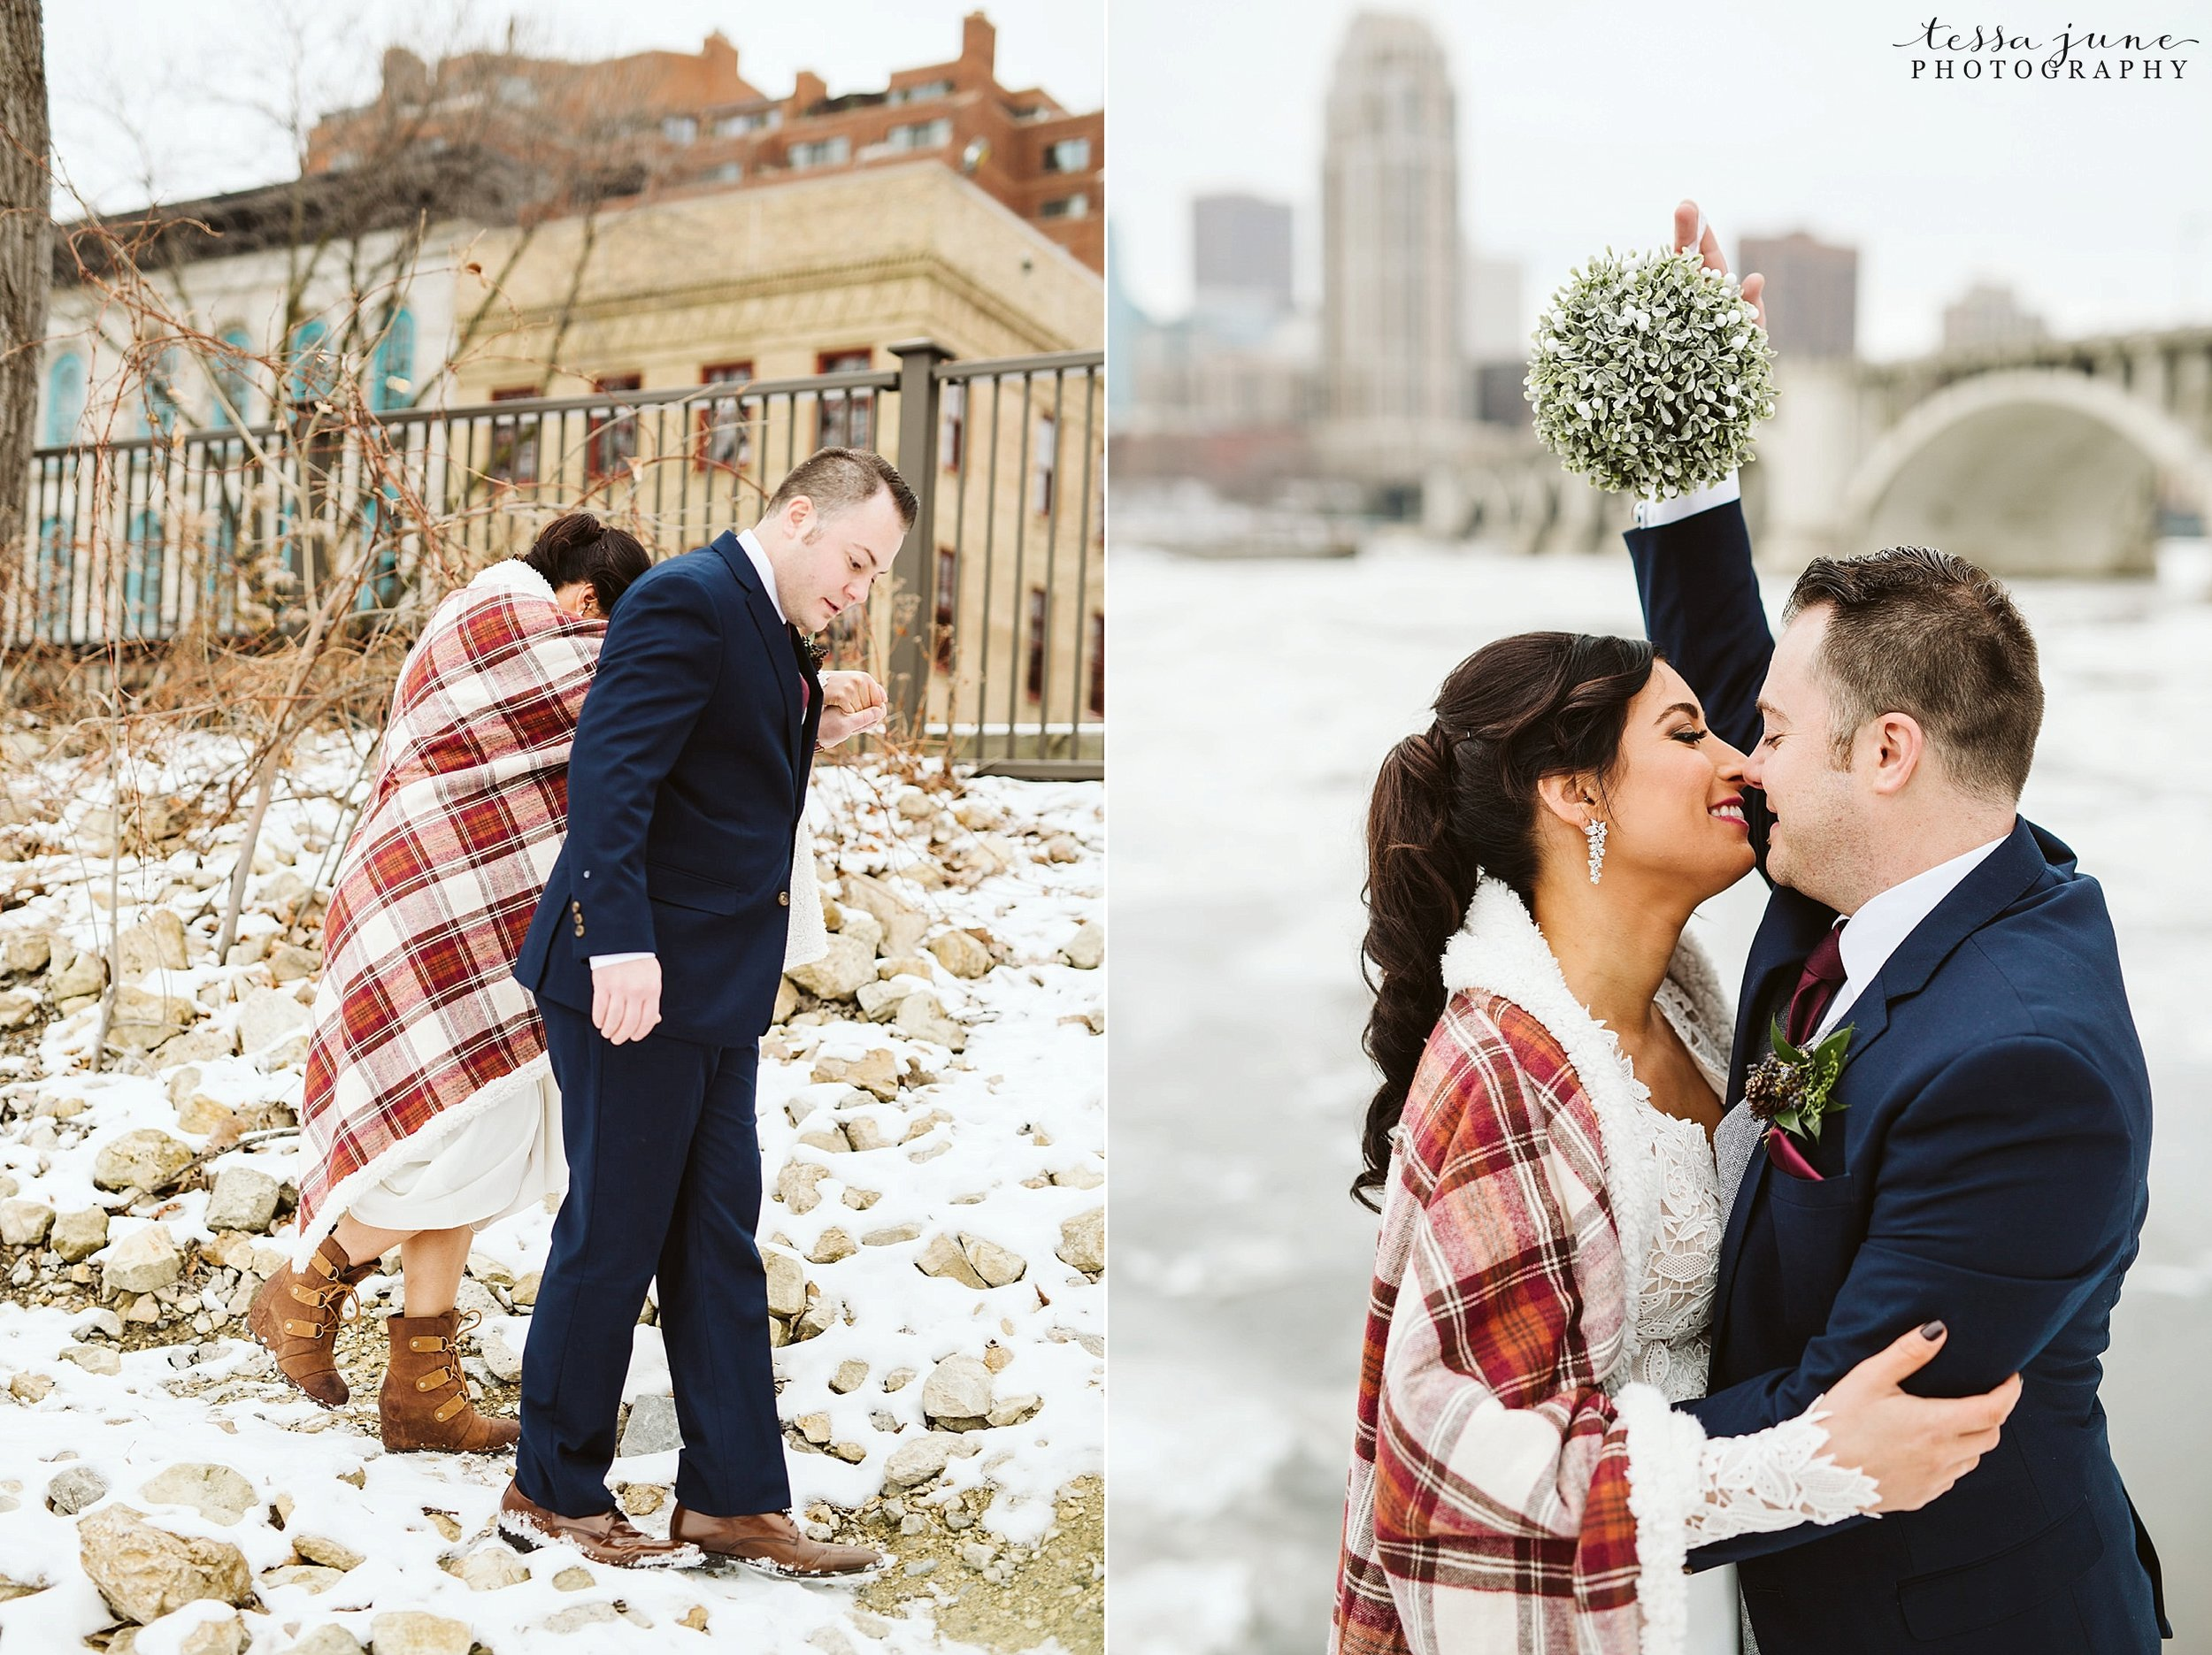 minneapolis-event-center-winter-romantic-snow-wedding-december-79.jpg